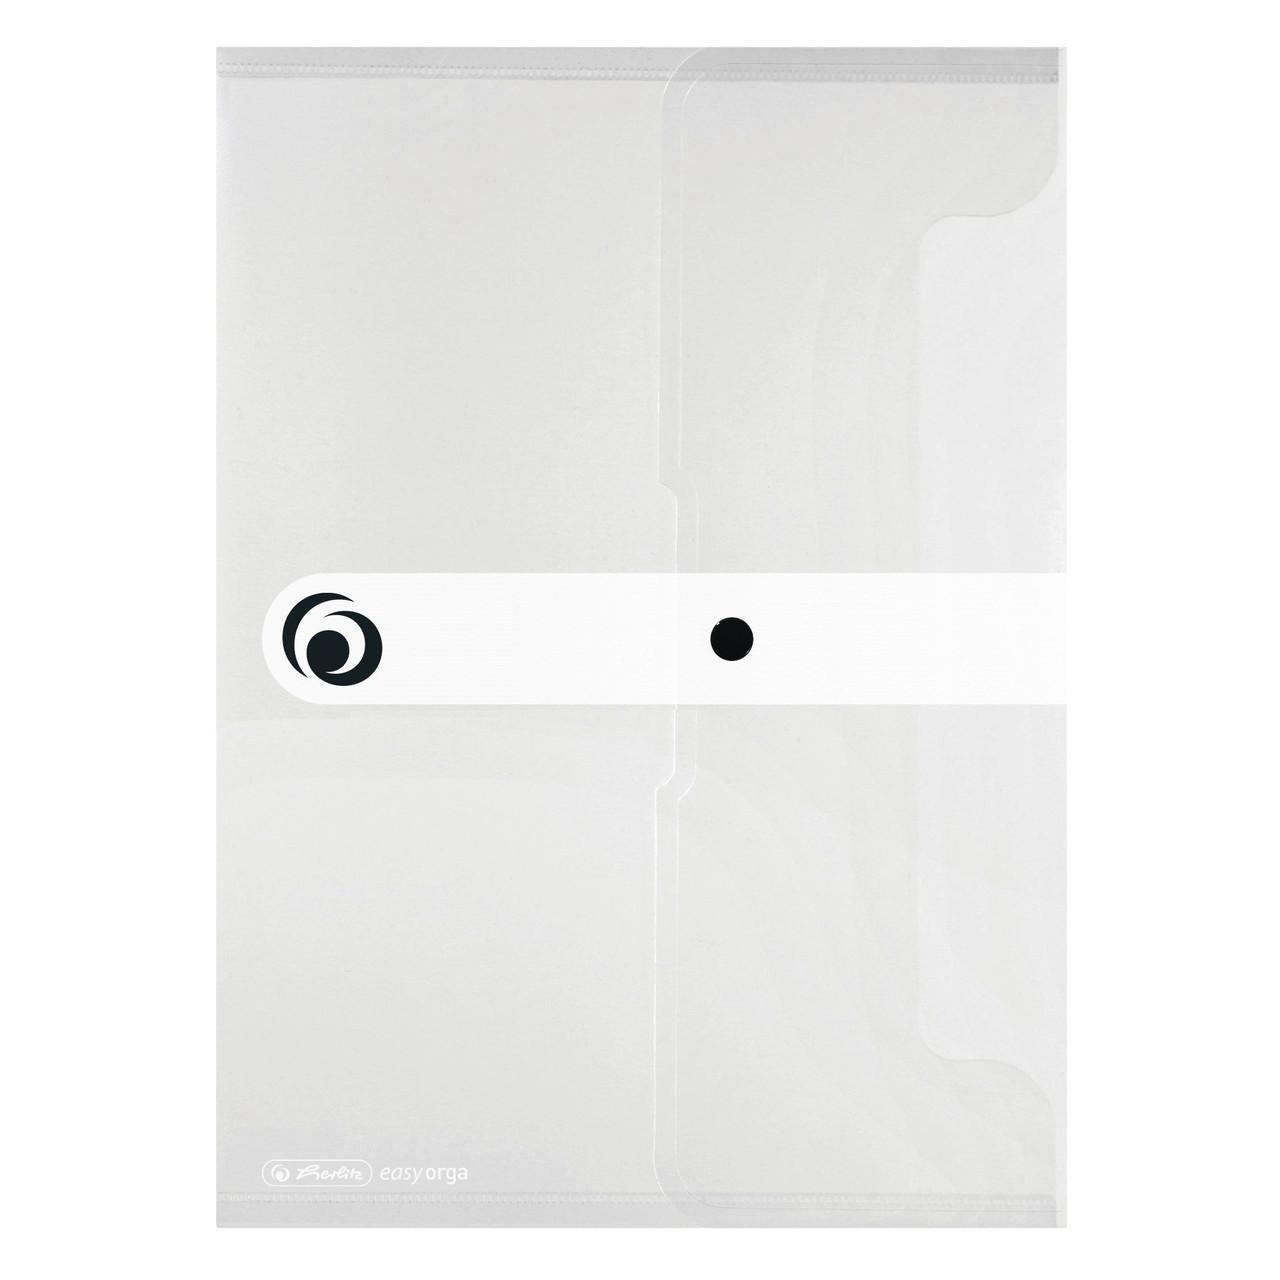 Папка на кнопке Herlitz А4 200мкм Easy Orga To Go бесцветная полупрозрачная (11206653)